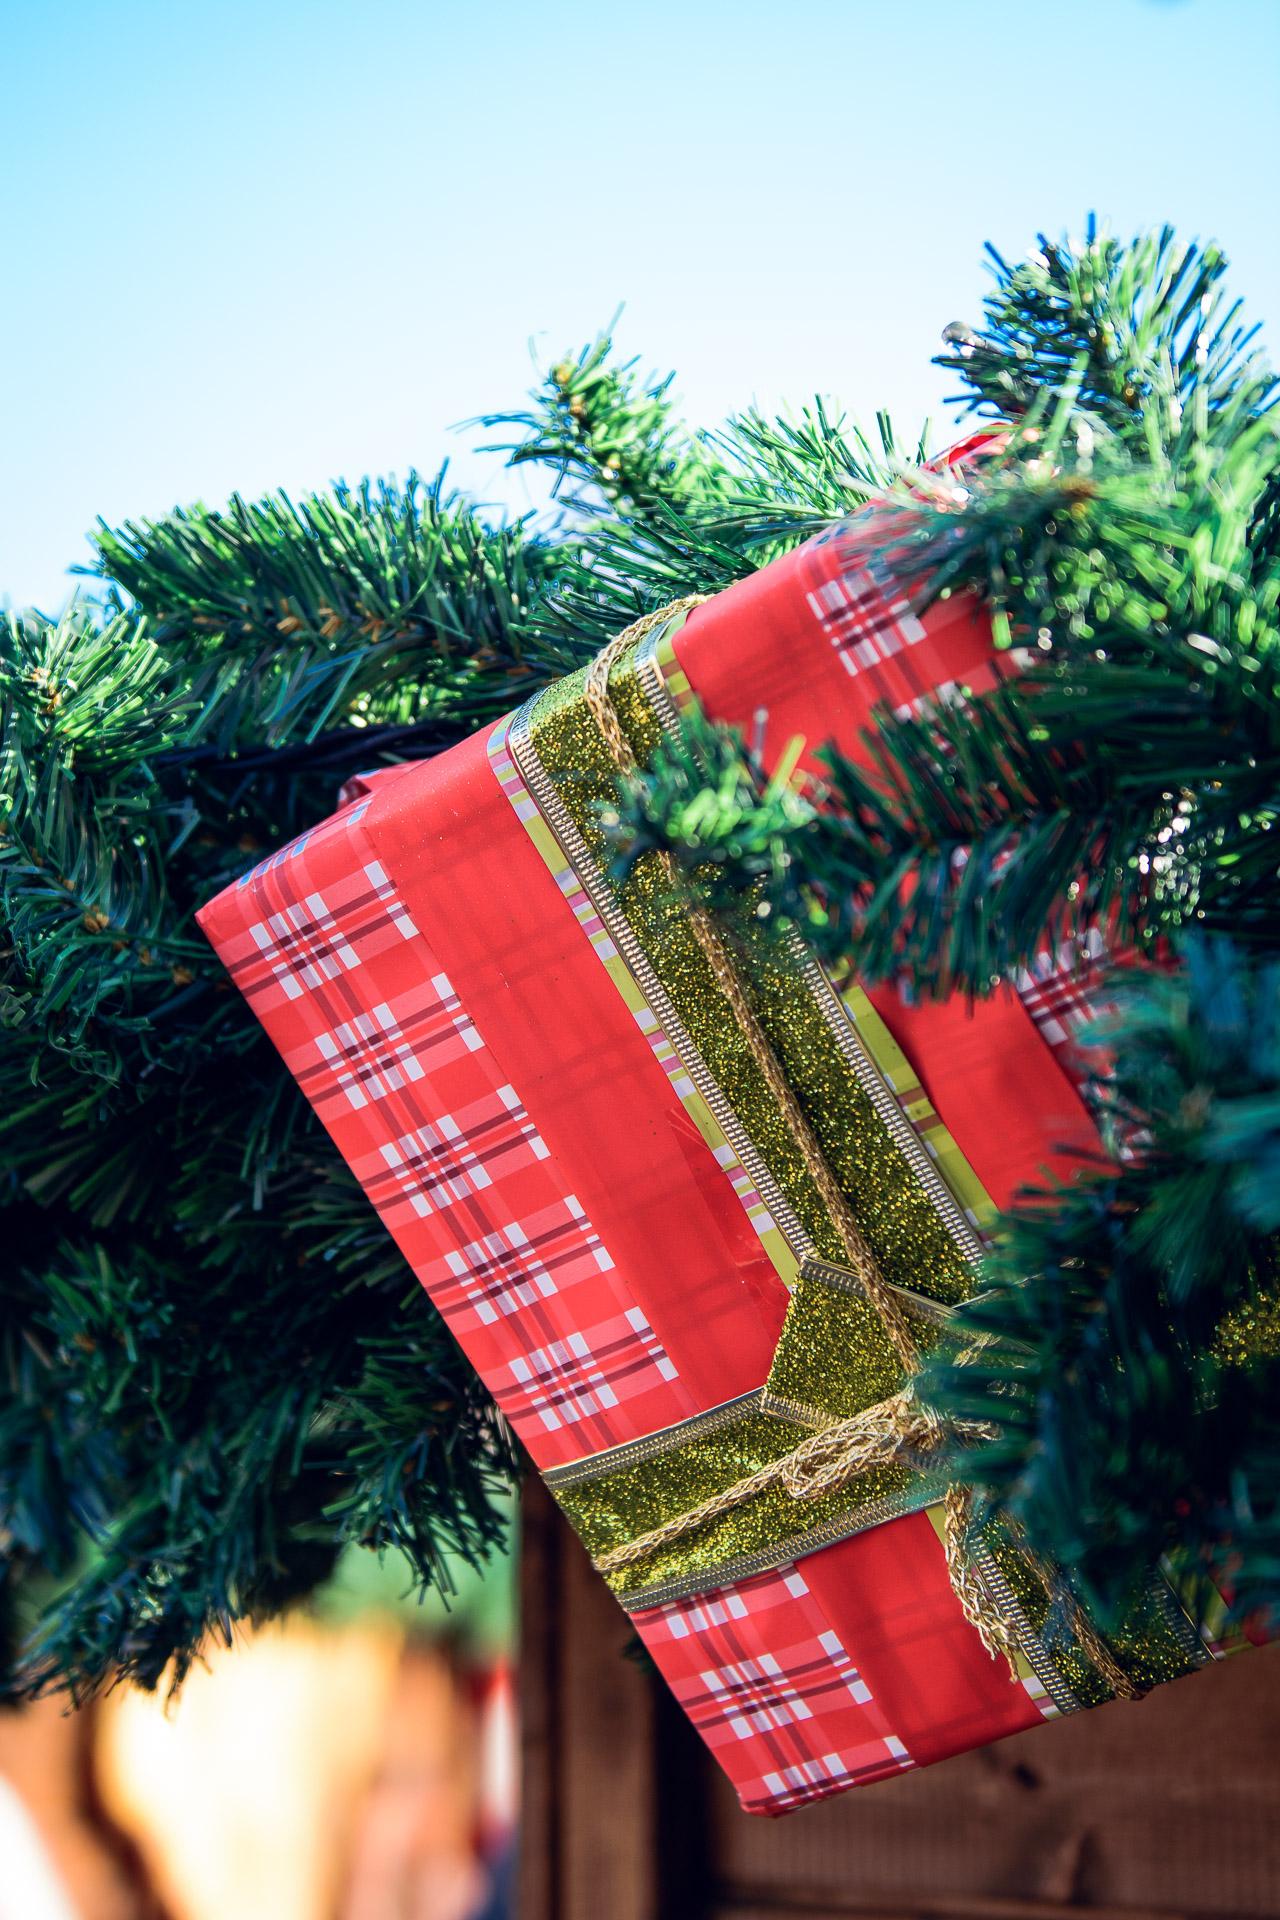 Christmas spirit present